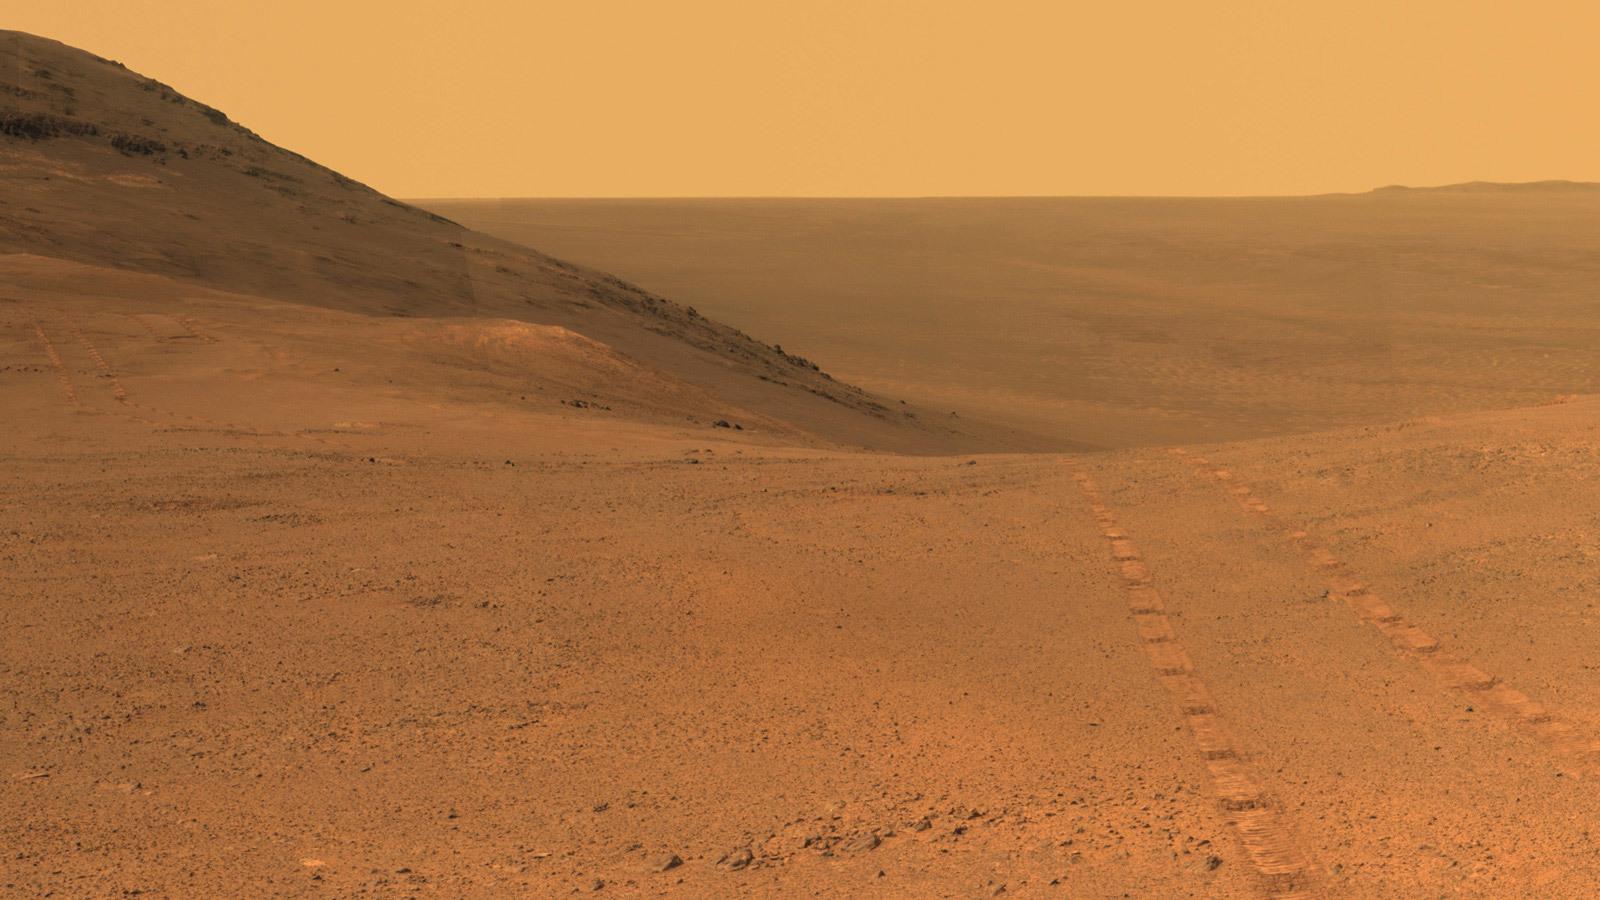 Opportunity rover still MIA as dust settles on Mars | Ars ...